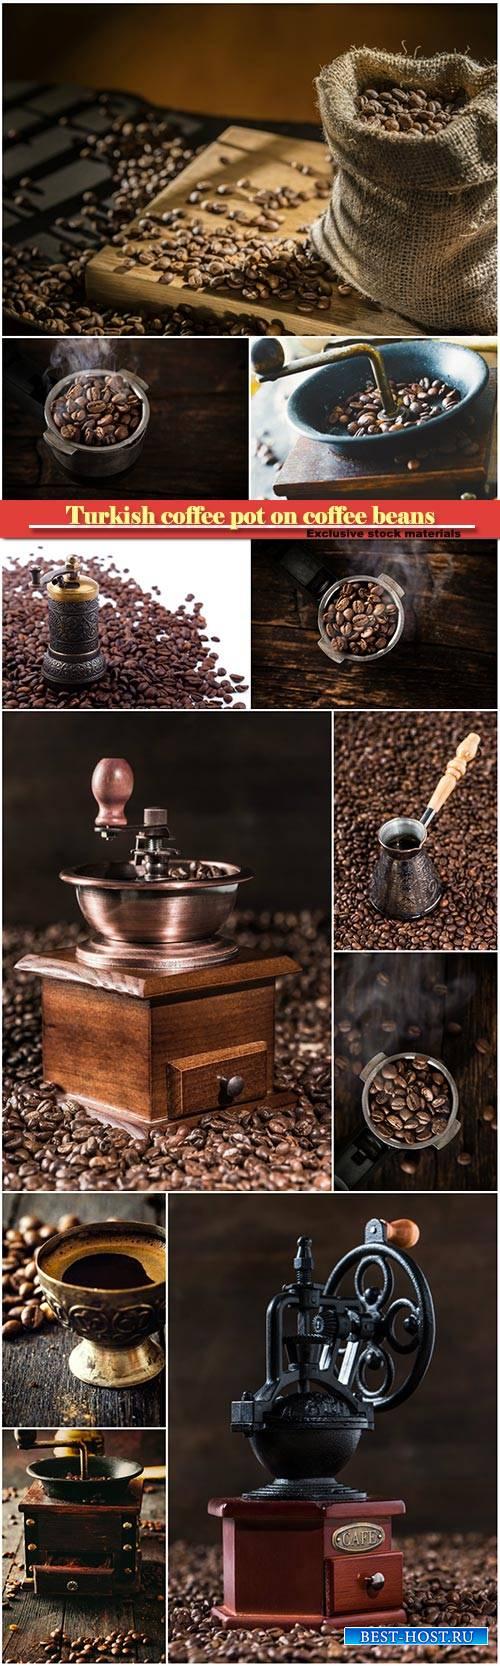 Turkish coffee pot on coffee beans, coffee mill